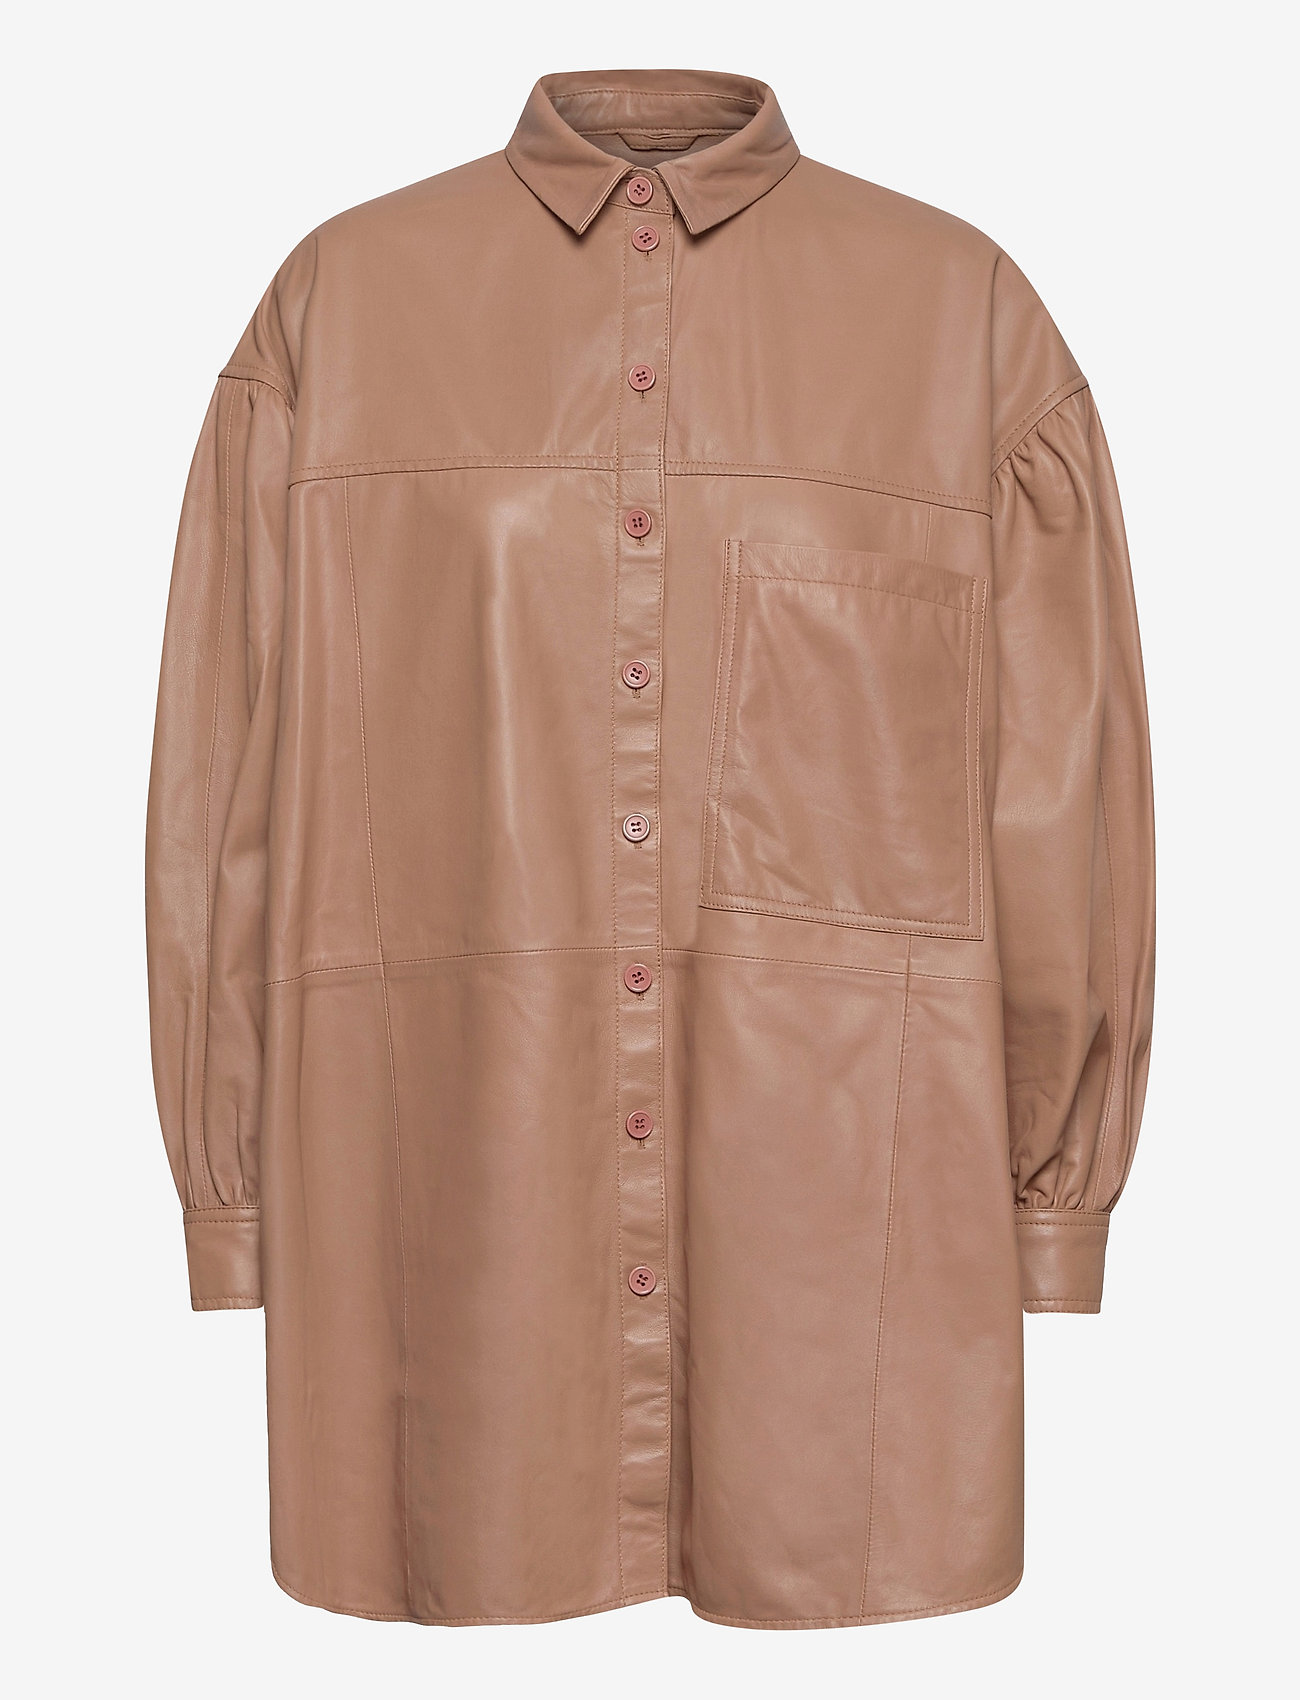 MDK / Munderingskompagniet - Emma leather shirt - overshirts - praline - 0